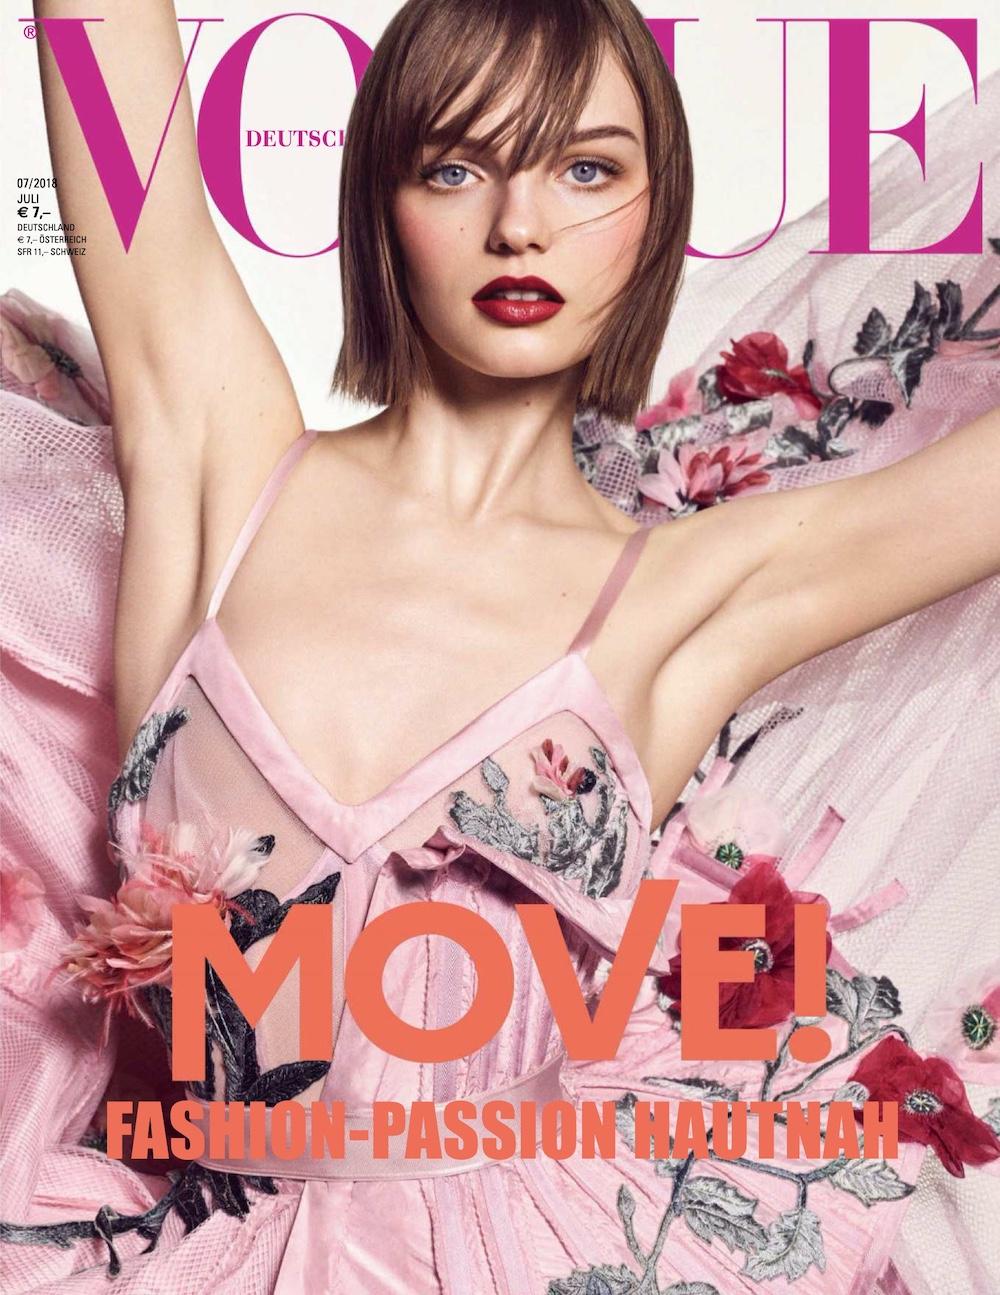 Vogue 2018-07